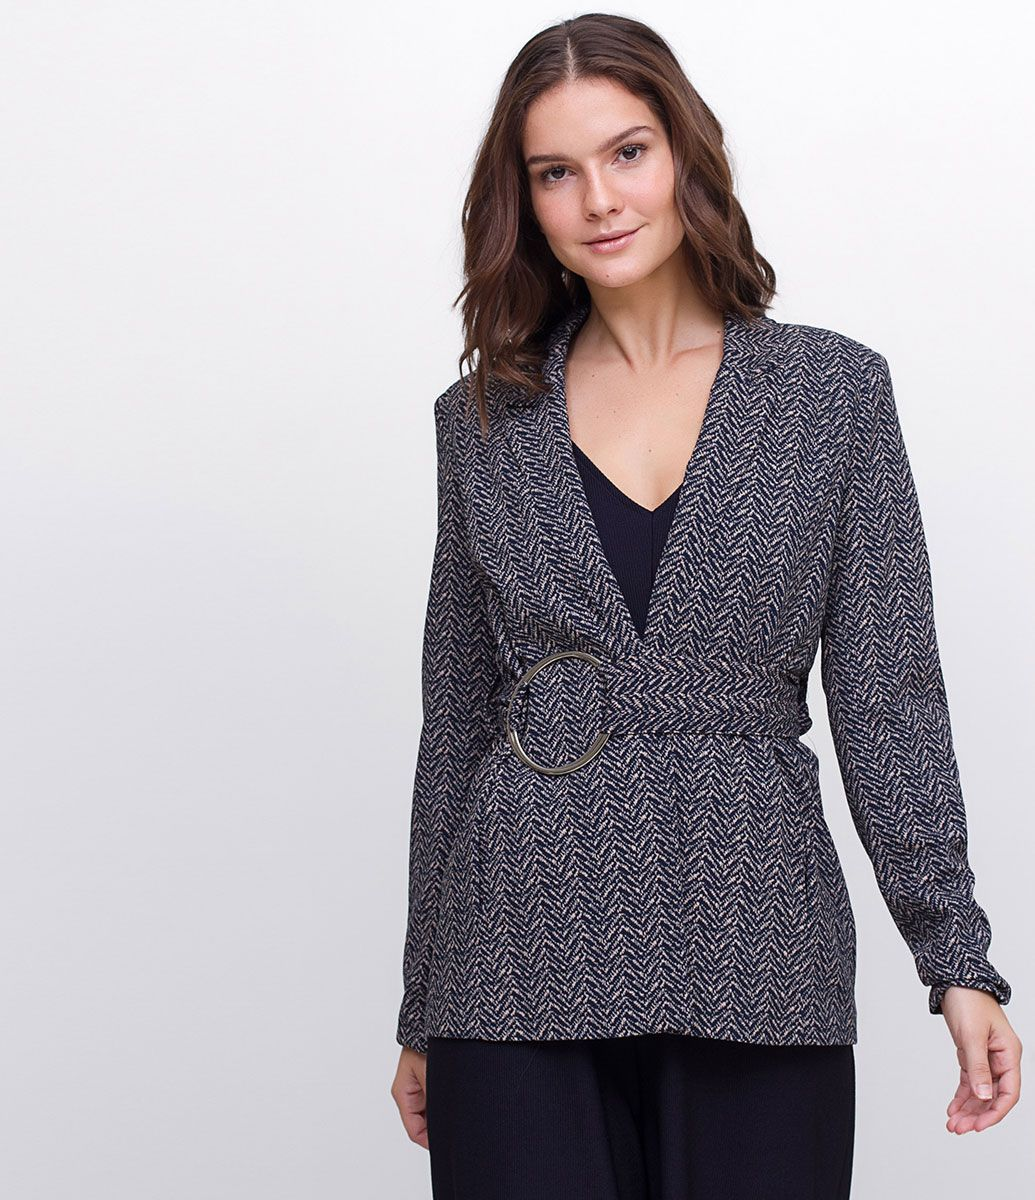 f222989fa3 Blazer feminino Com faixa na cintura Estampa Geométrica Marca  Cortelle  Tecido  Crepe Modelo veste